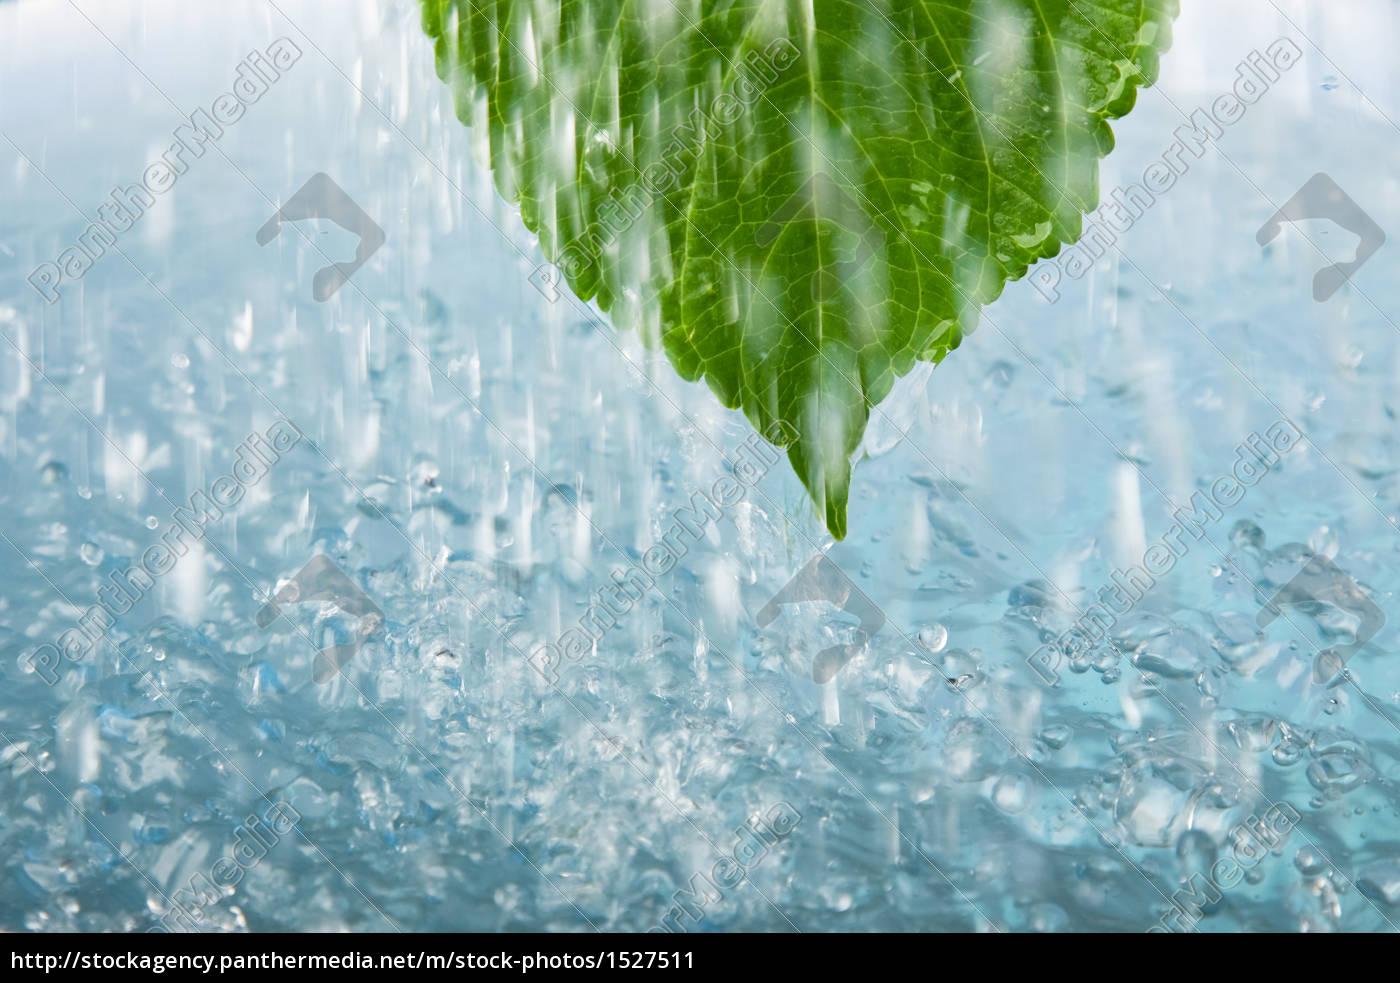 leaf, relaxation, wellness, shower, bathing resort, spa - 1527511